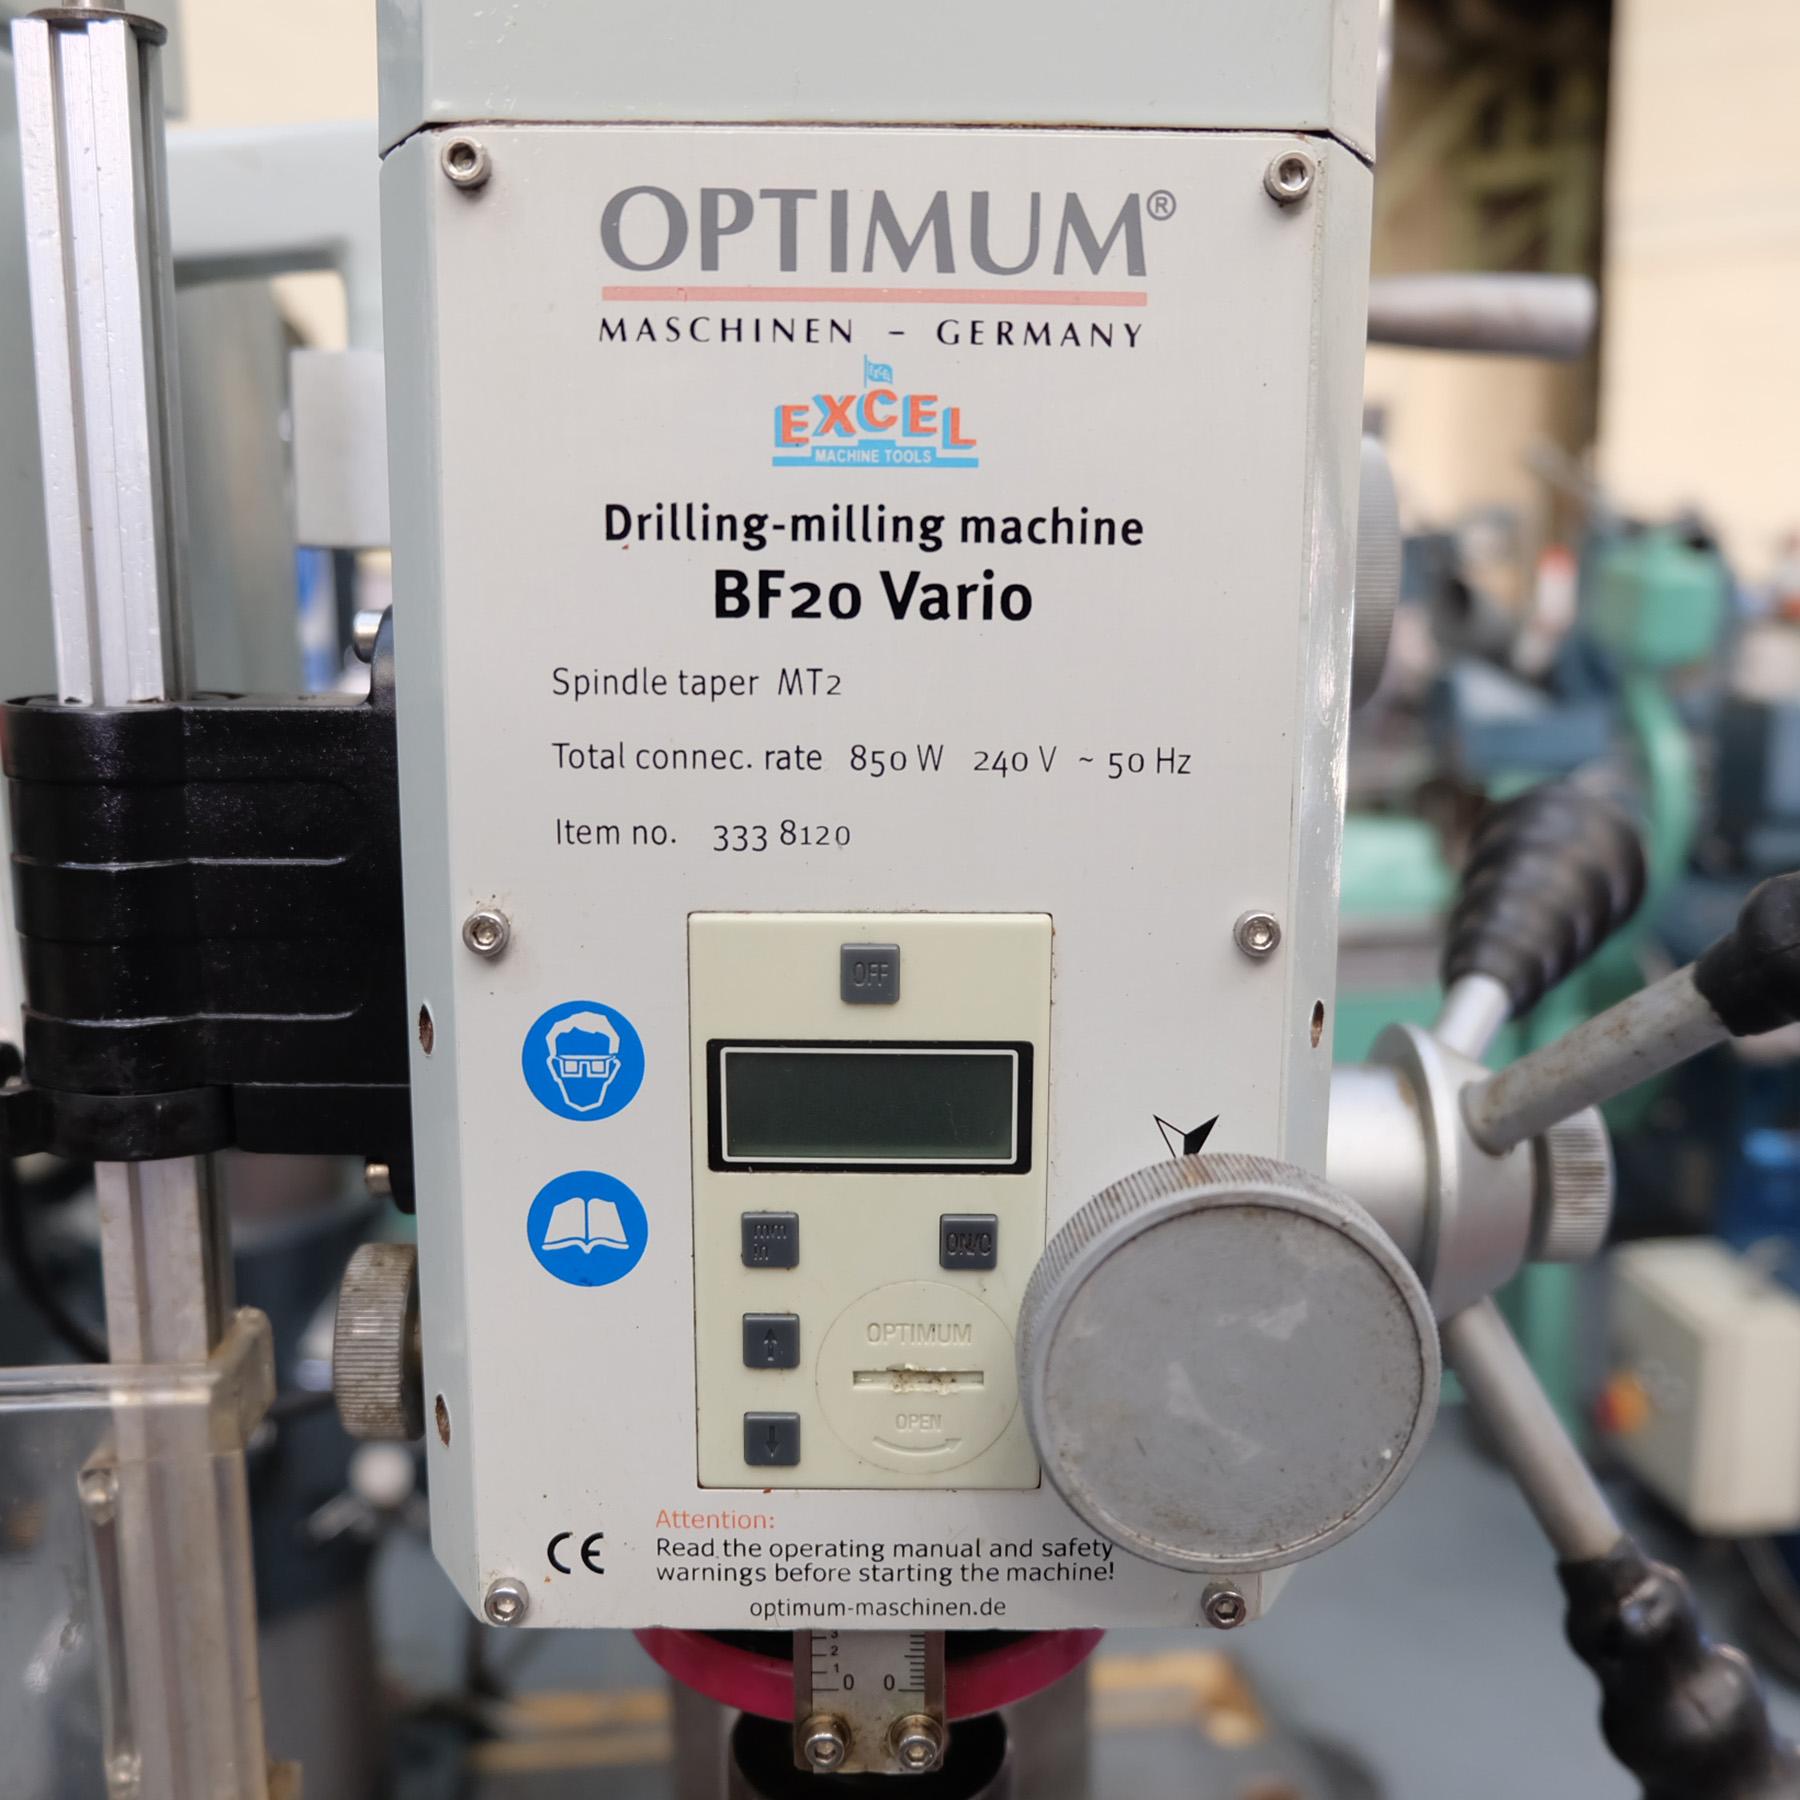 Optimum BF20 Vario Drilling/Milling Machine. - Image 4 of 11